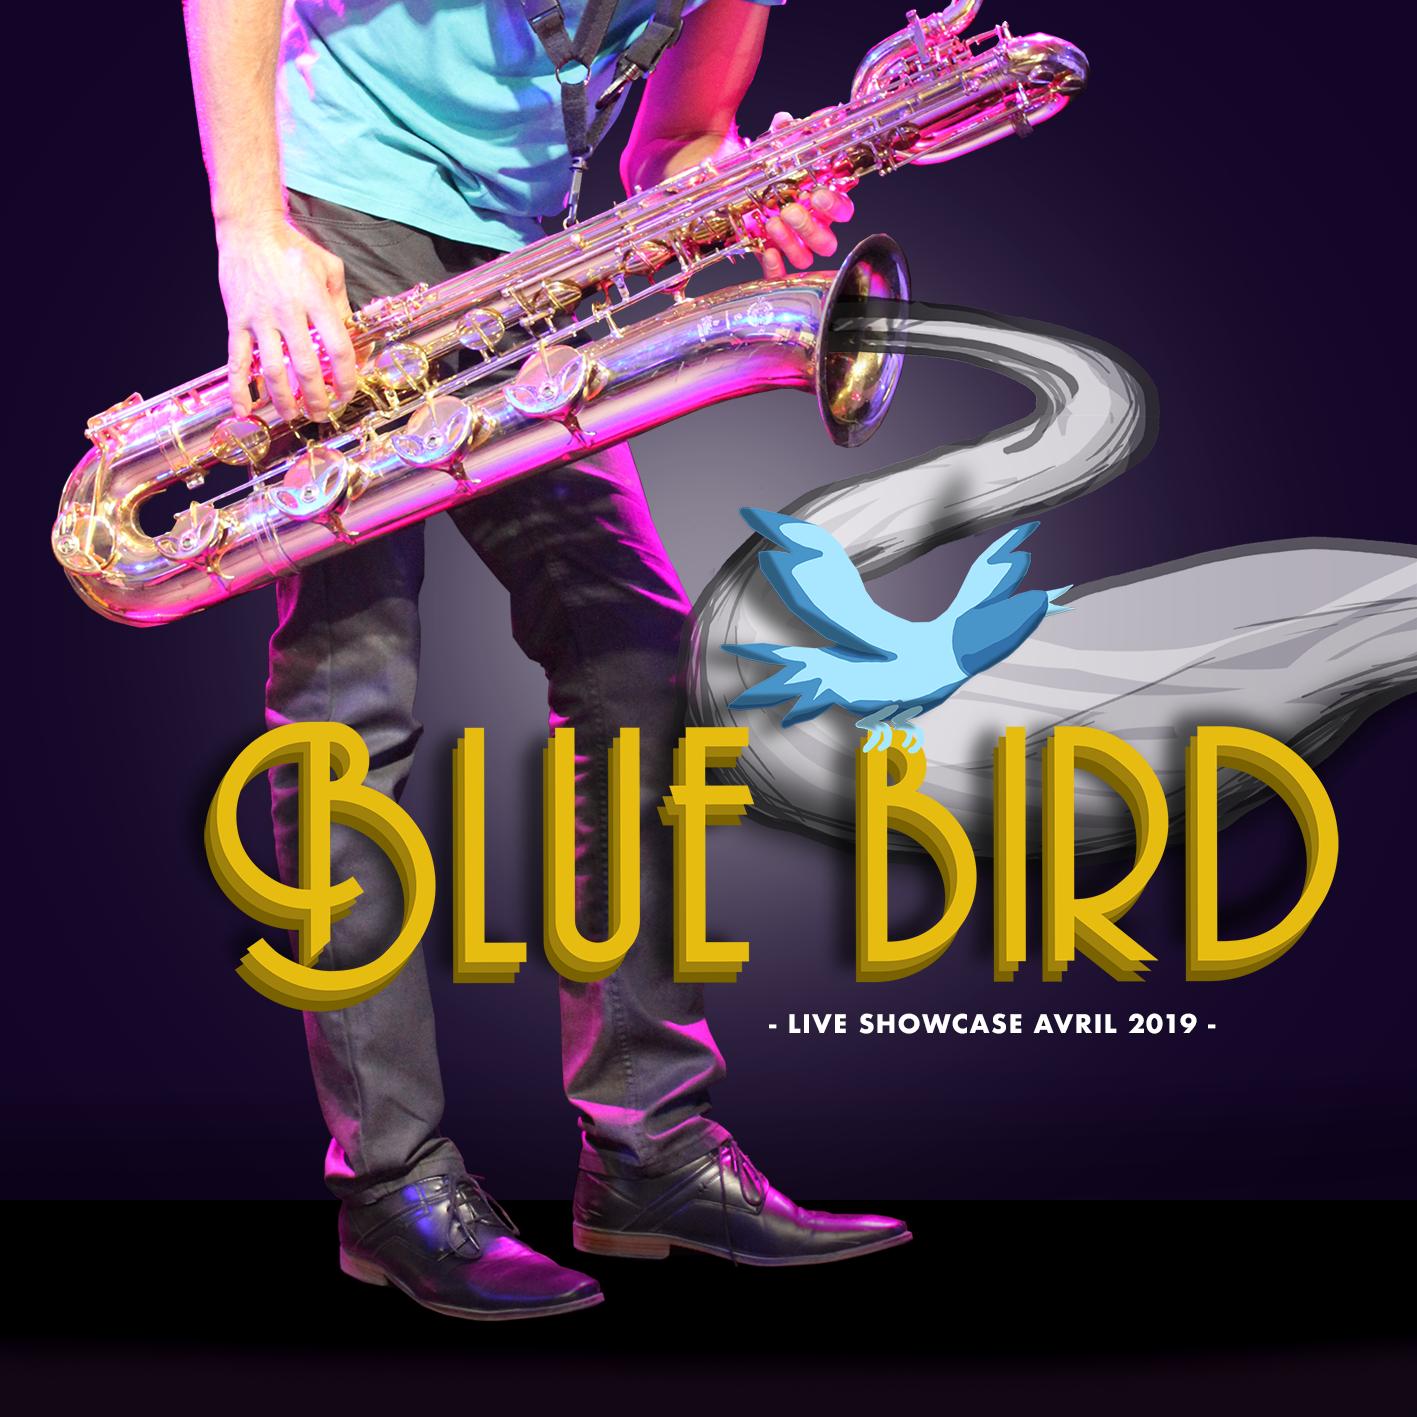 Blue Bird, showcase 2019